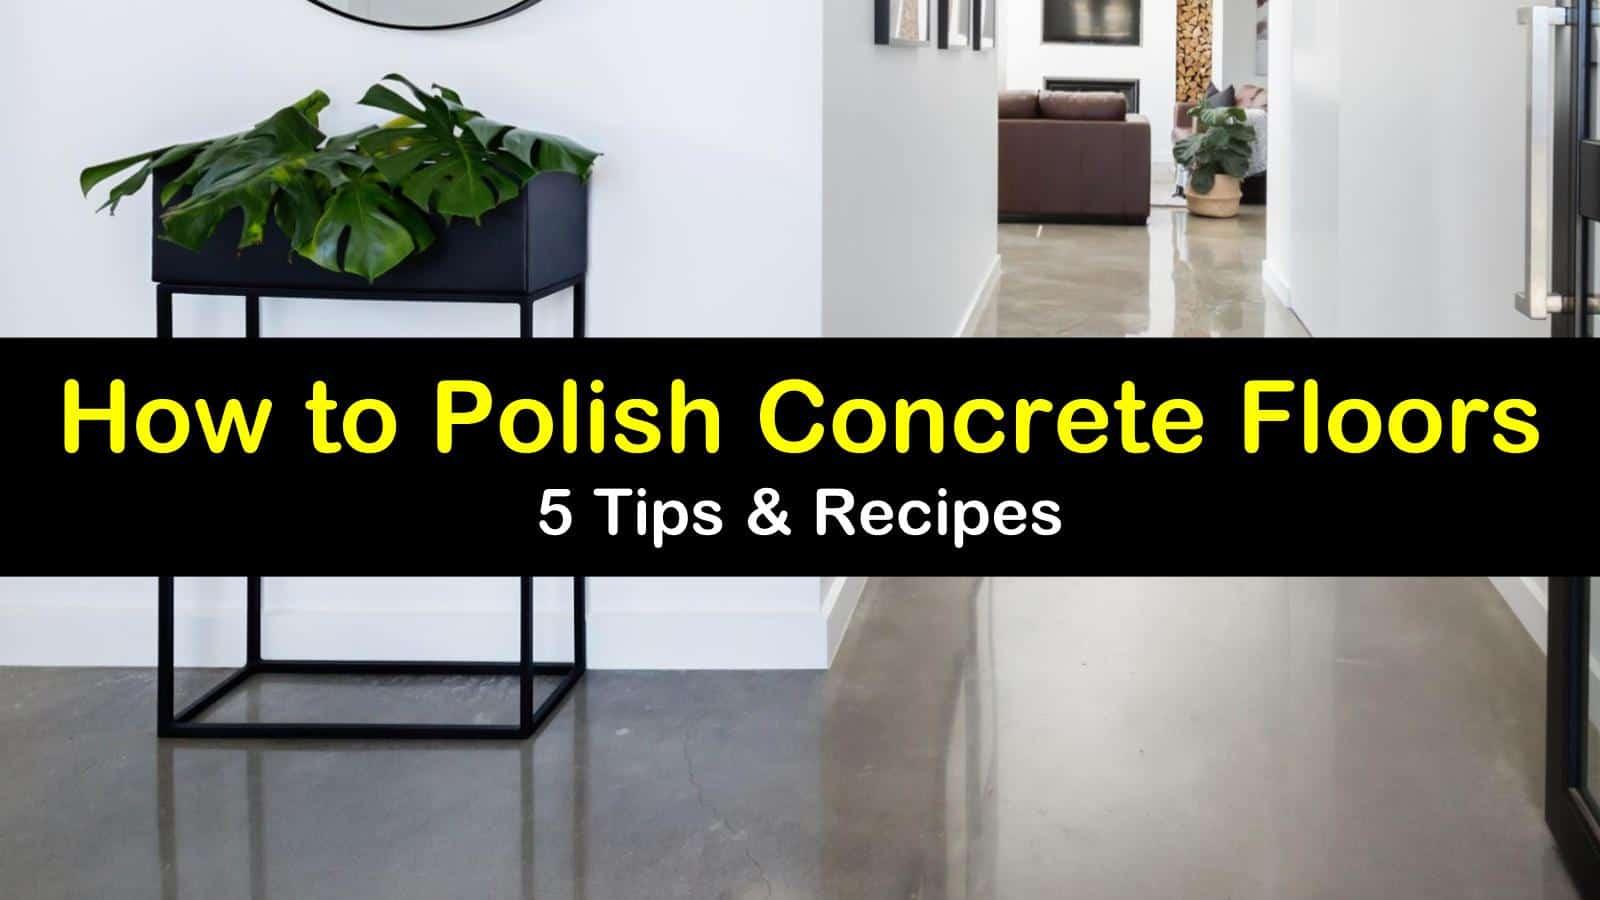 How To Polish Concrete Floors 5 Tips